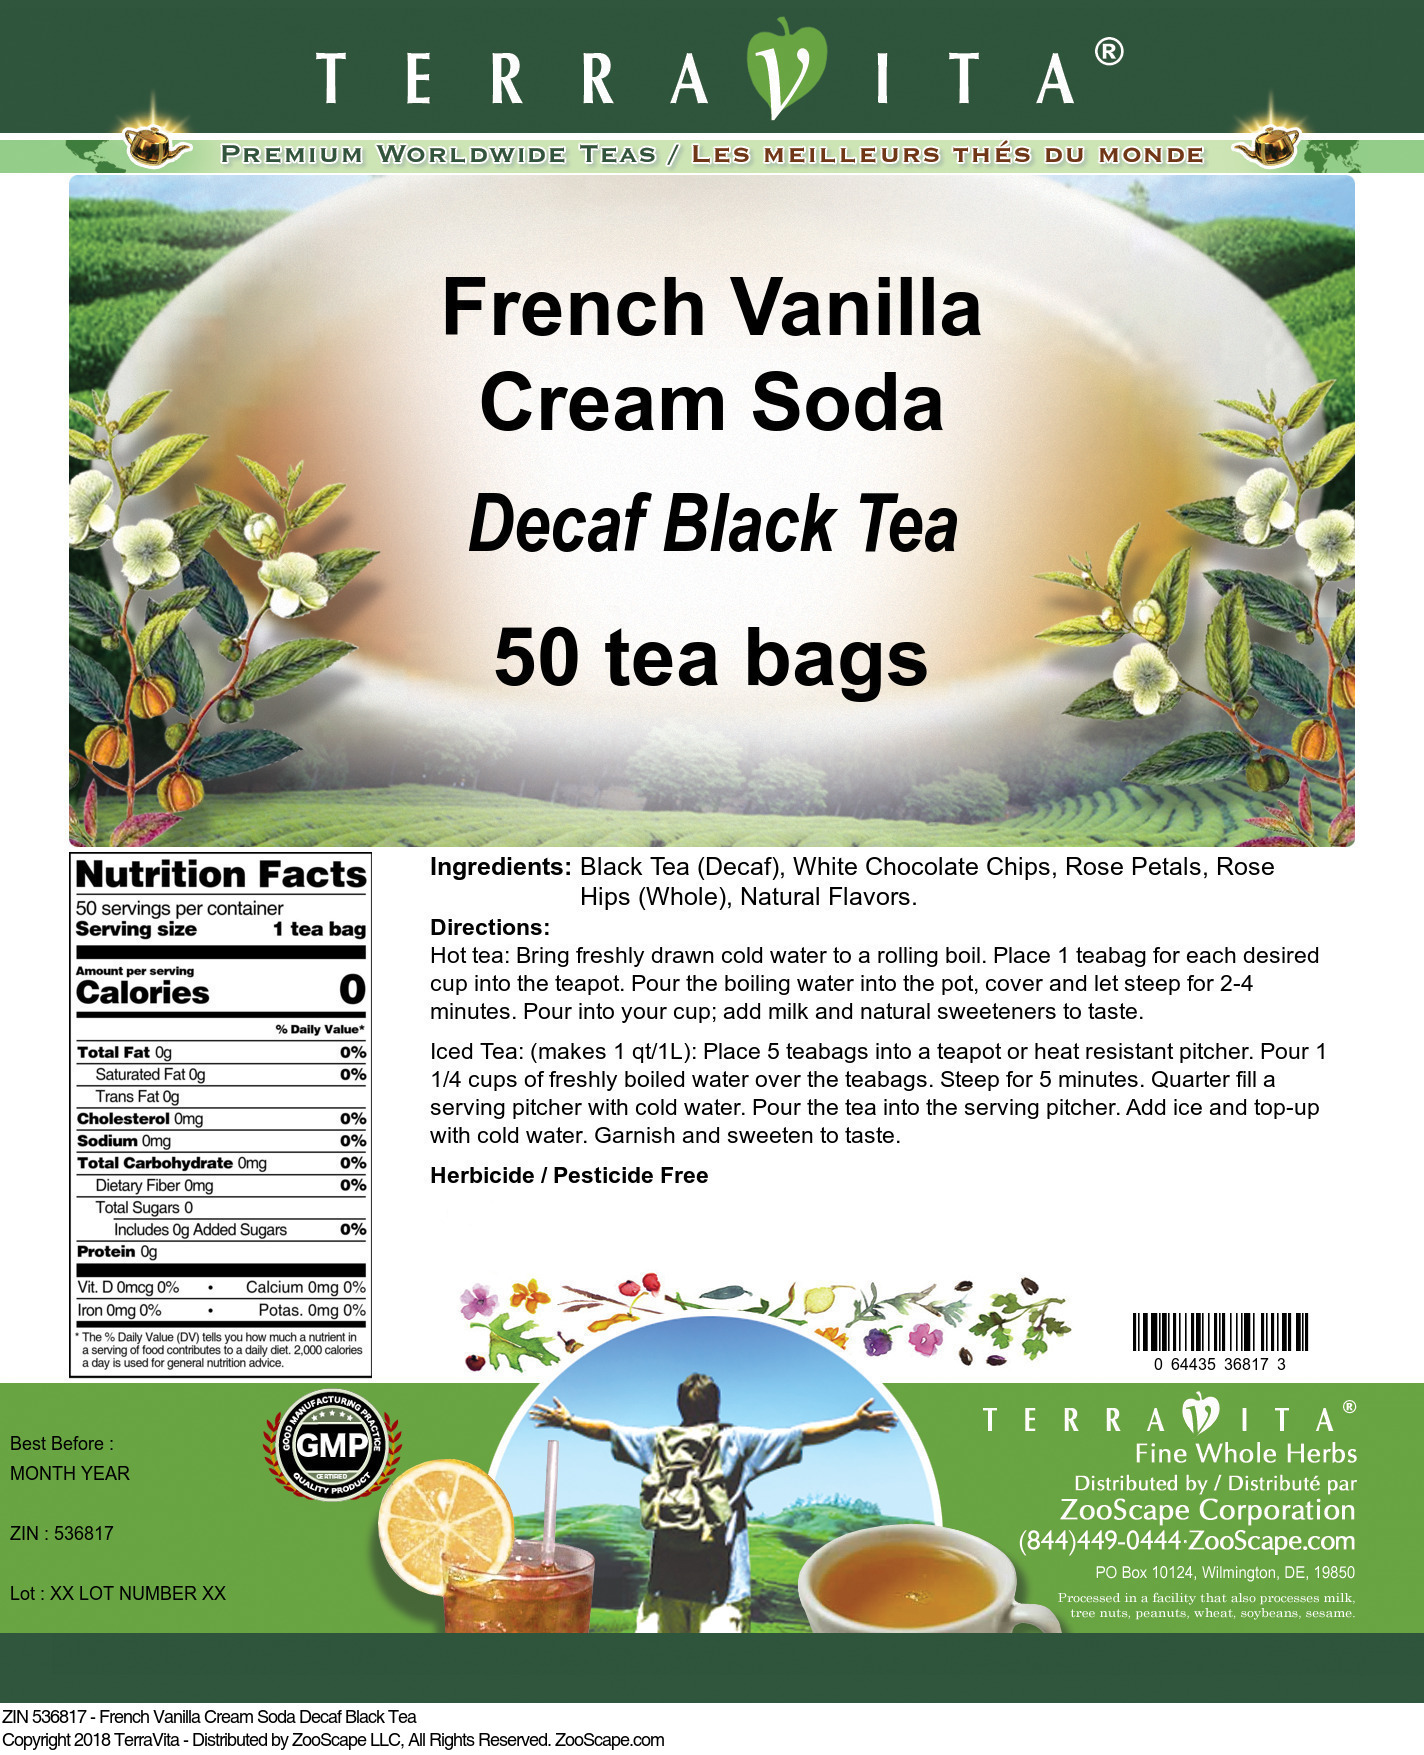 French Vanilla Cream Soda Decaf Black Tea